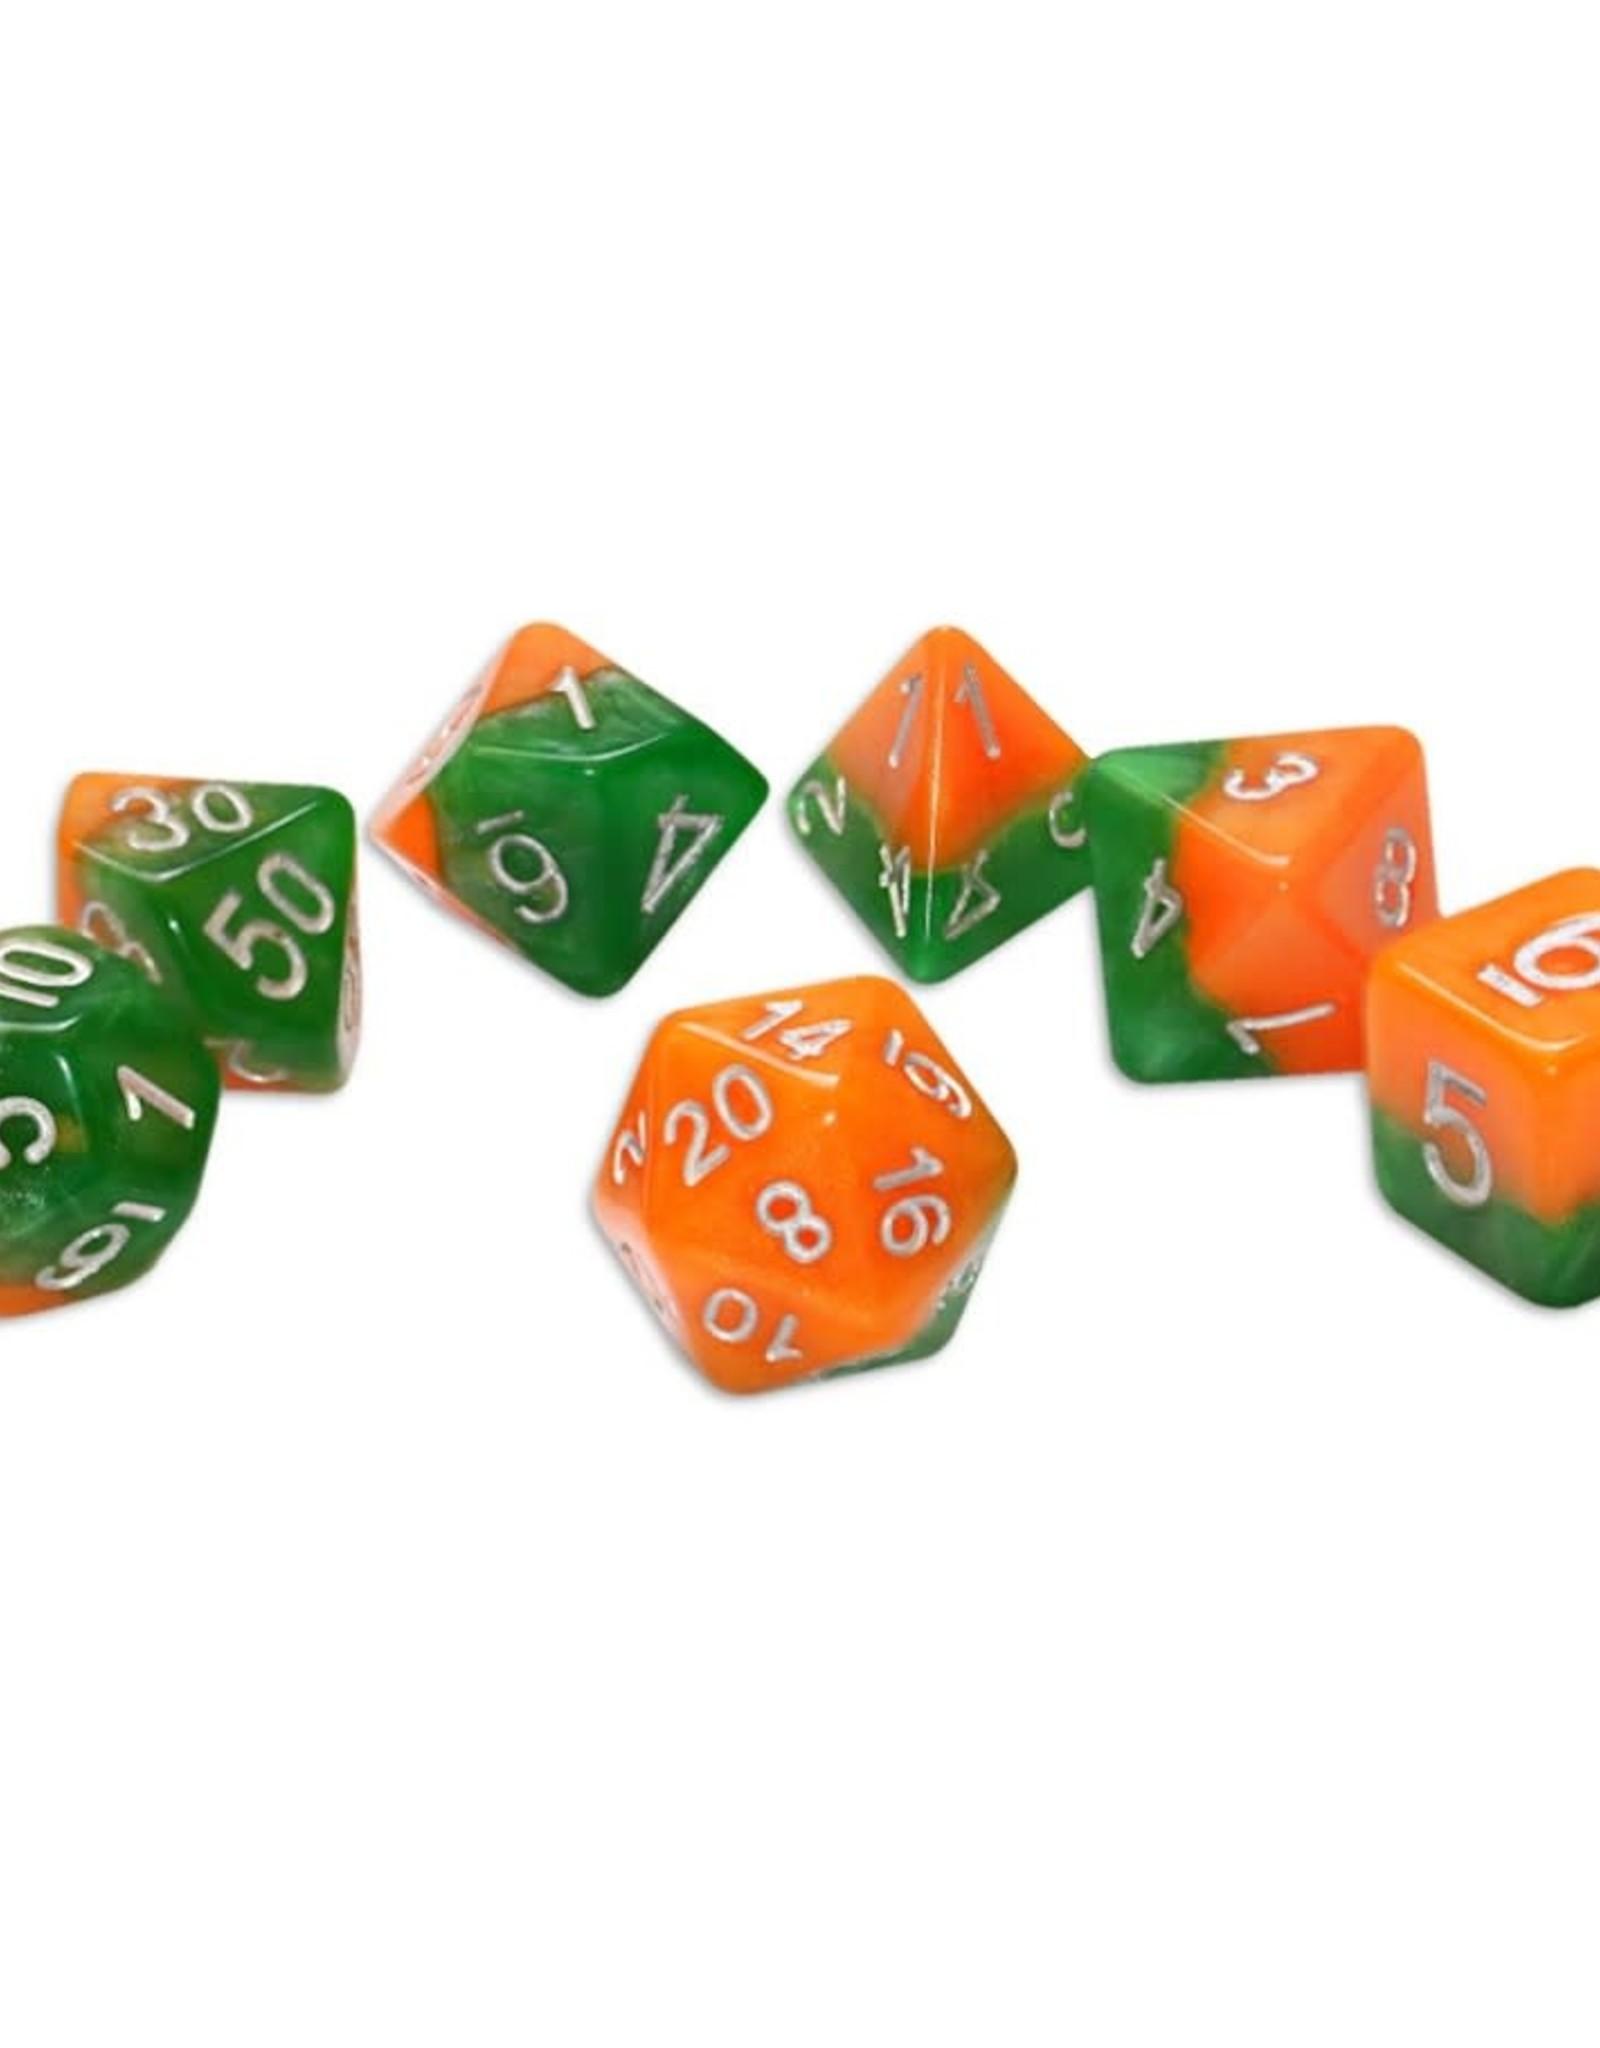 Gate Keeper Games Halfsies Dice: Great (7 Polyhedral Dice Set)